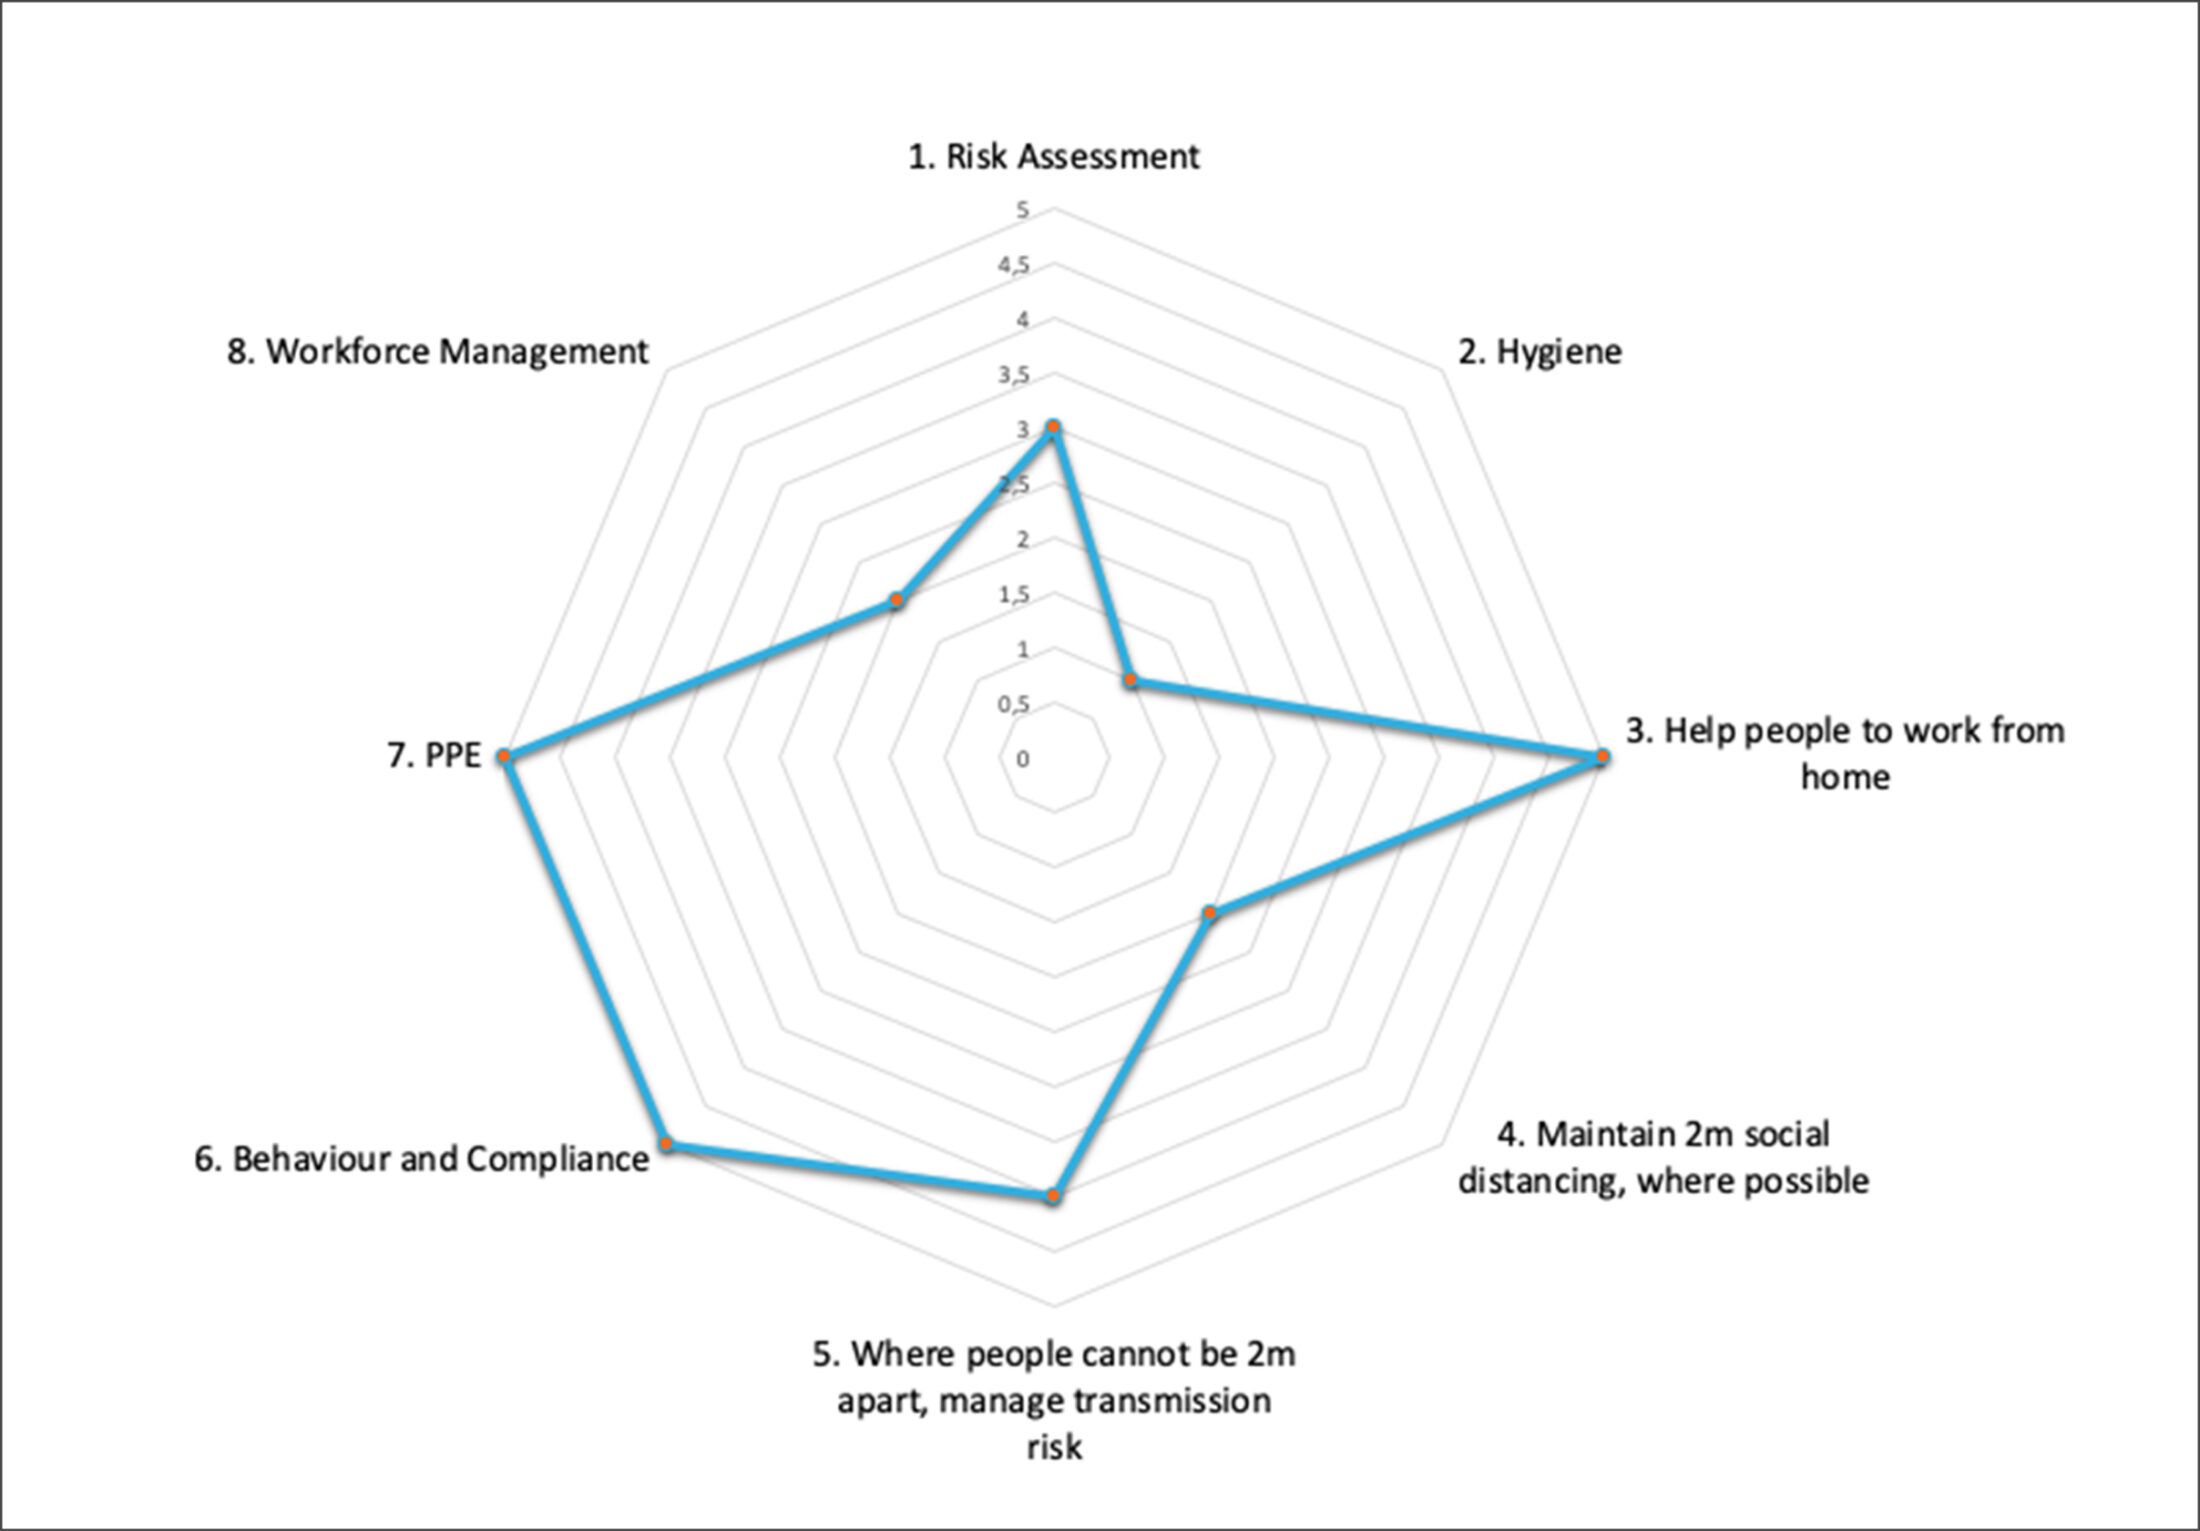 COVID-19 Risk Assessment - 8 key criteria